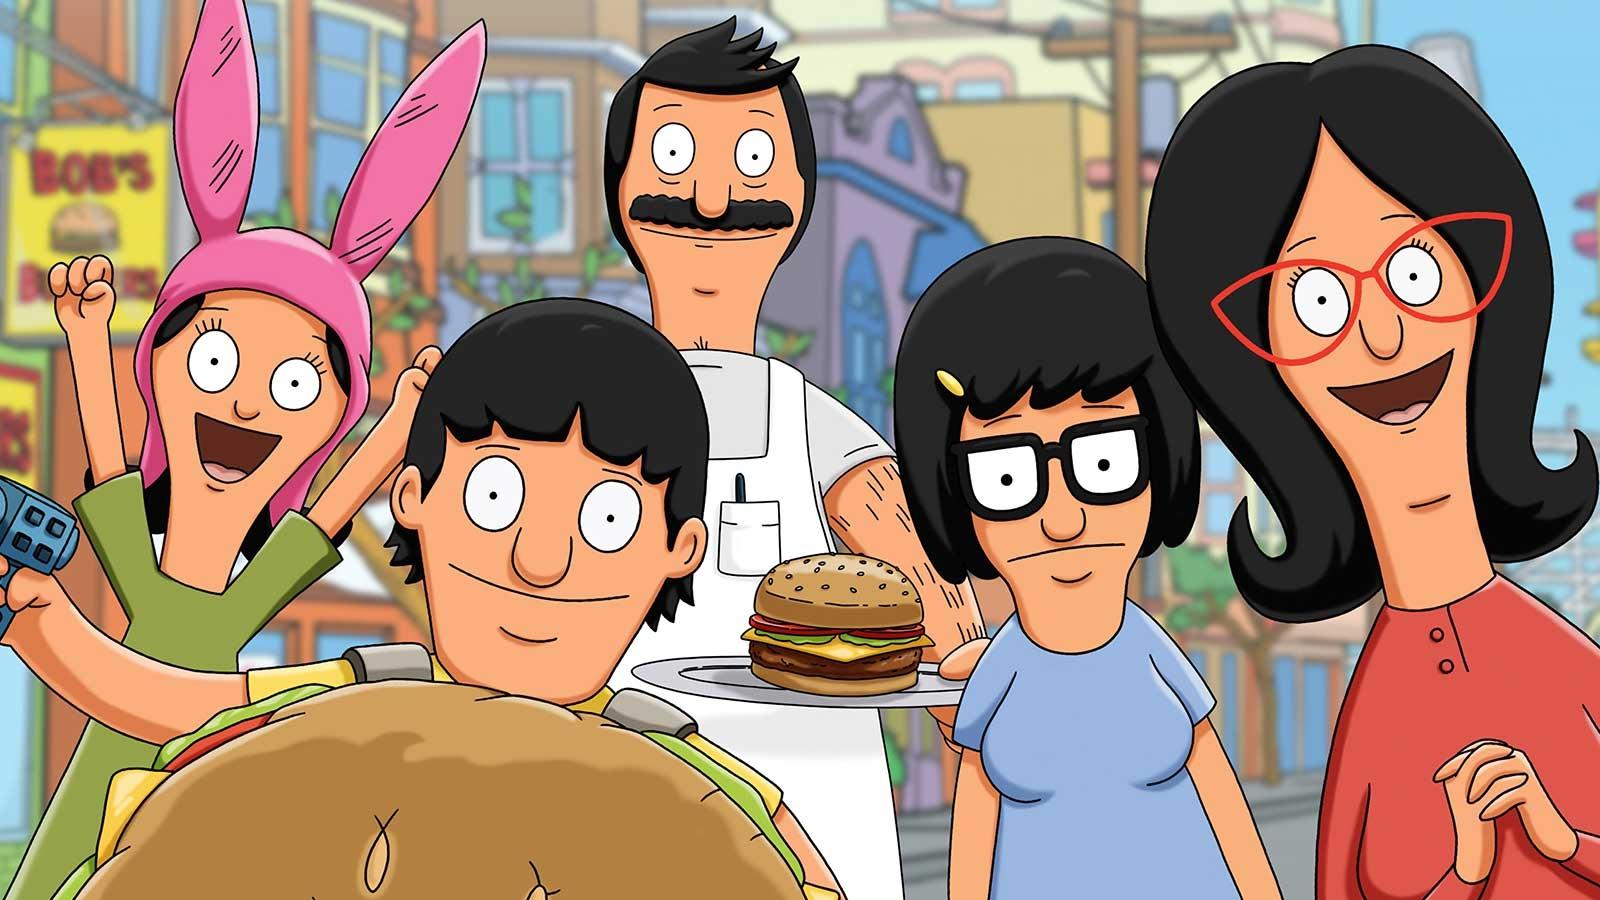 bobs burgers complete season 1 download